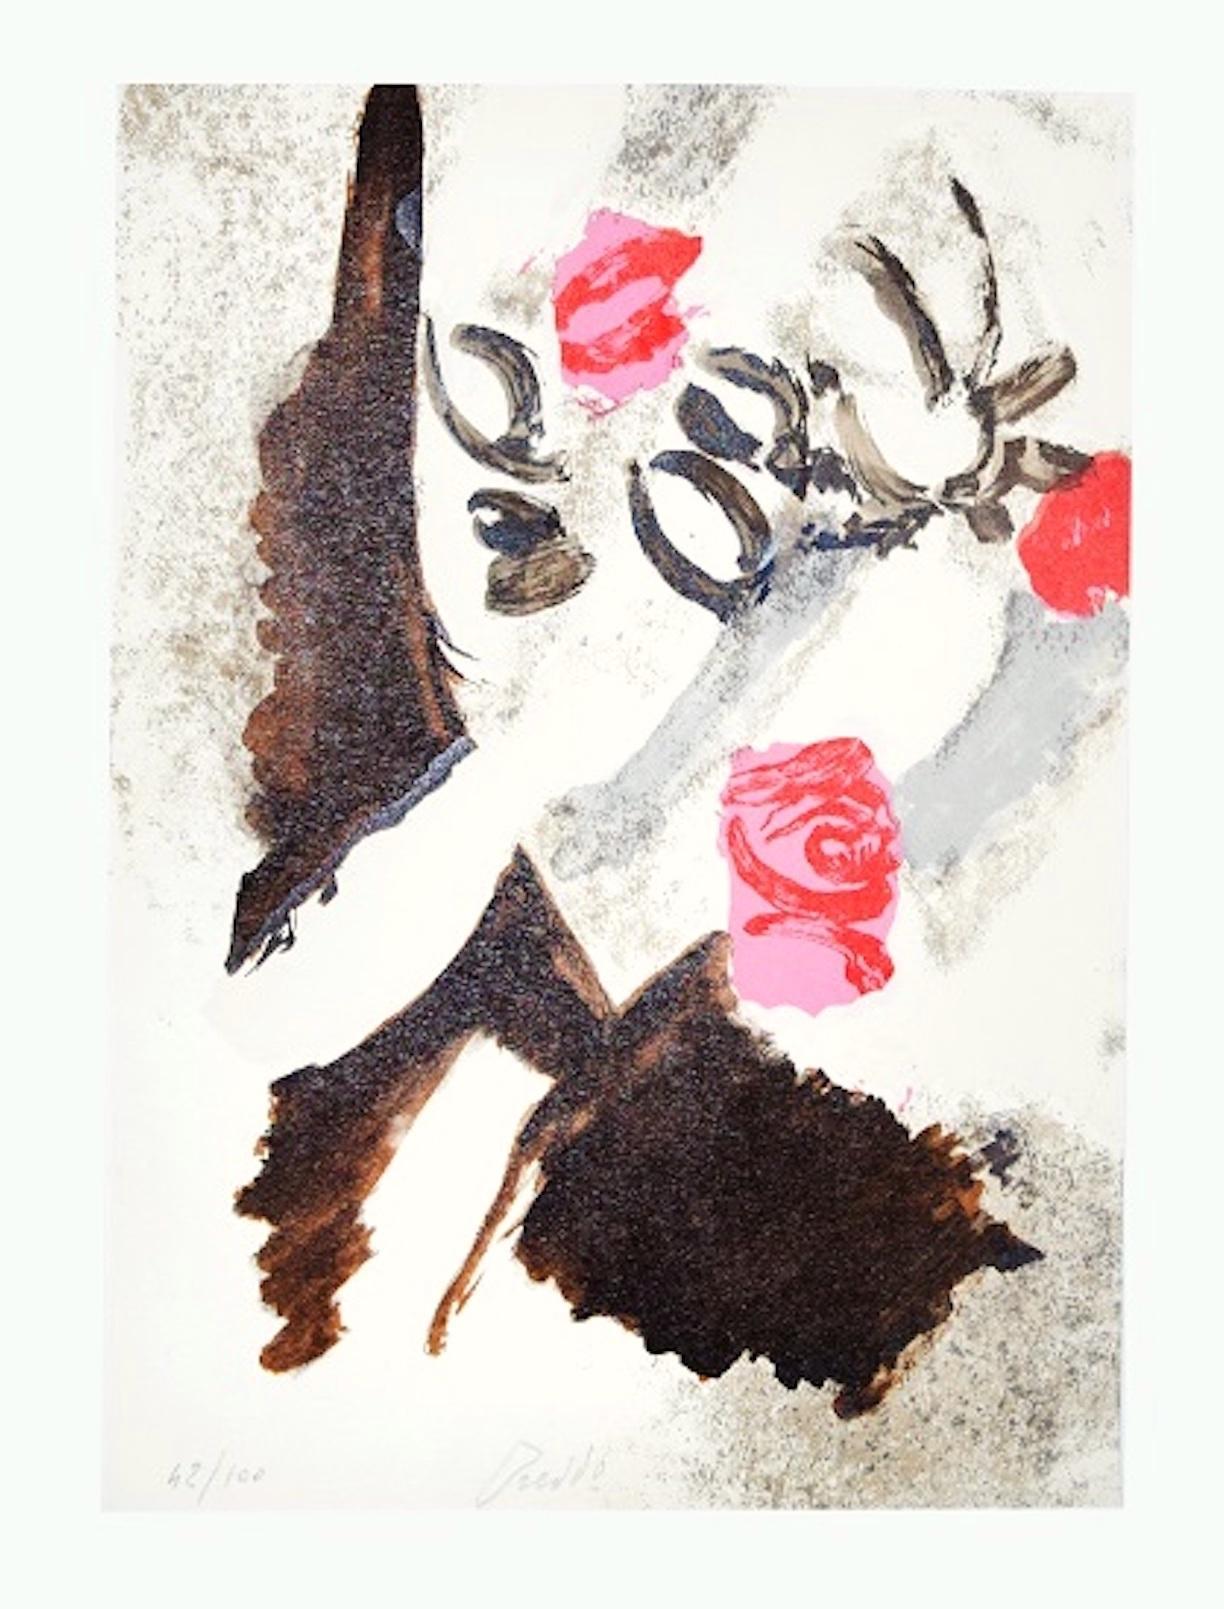 Pink Bouuet - Original Lithograph by Gastone Breddo - 1970s